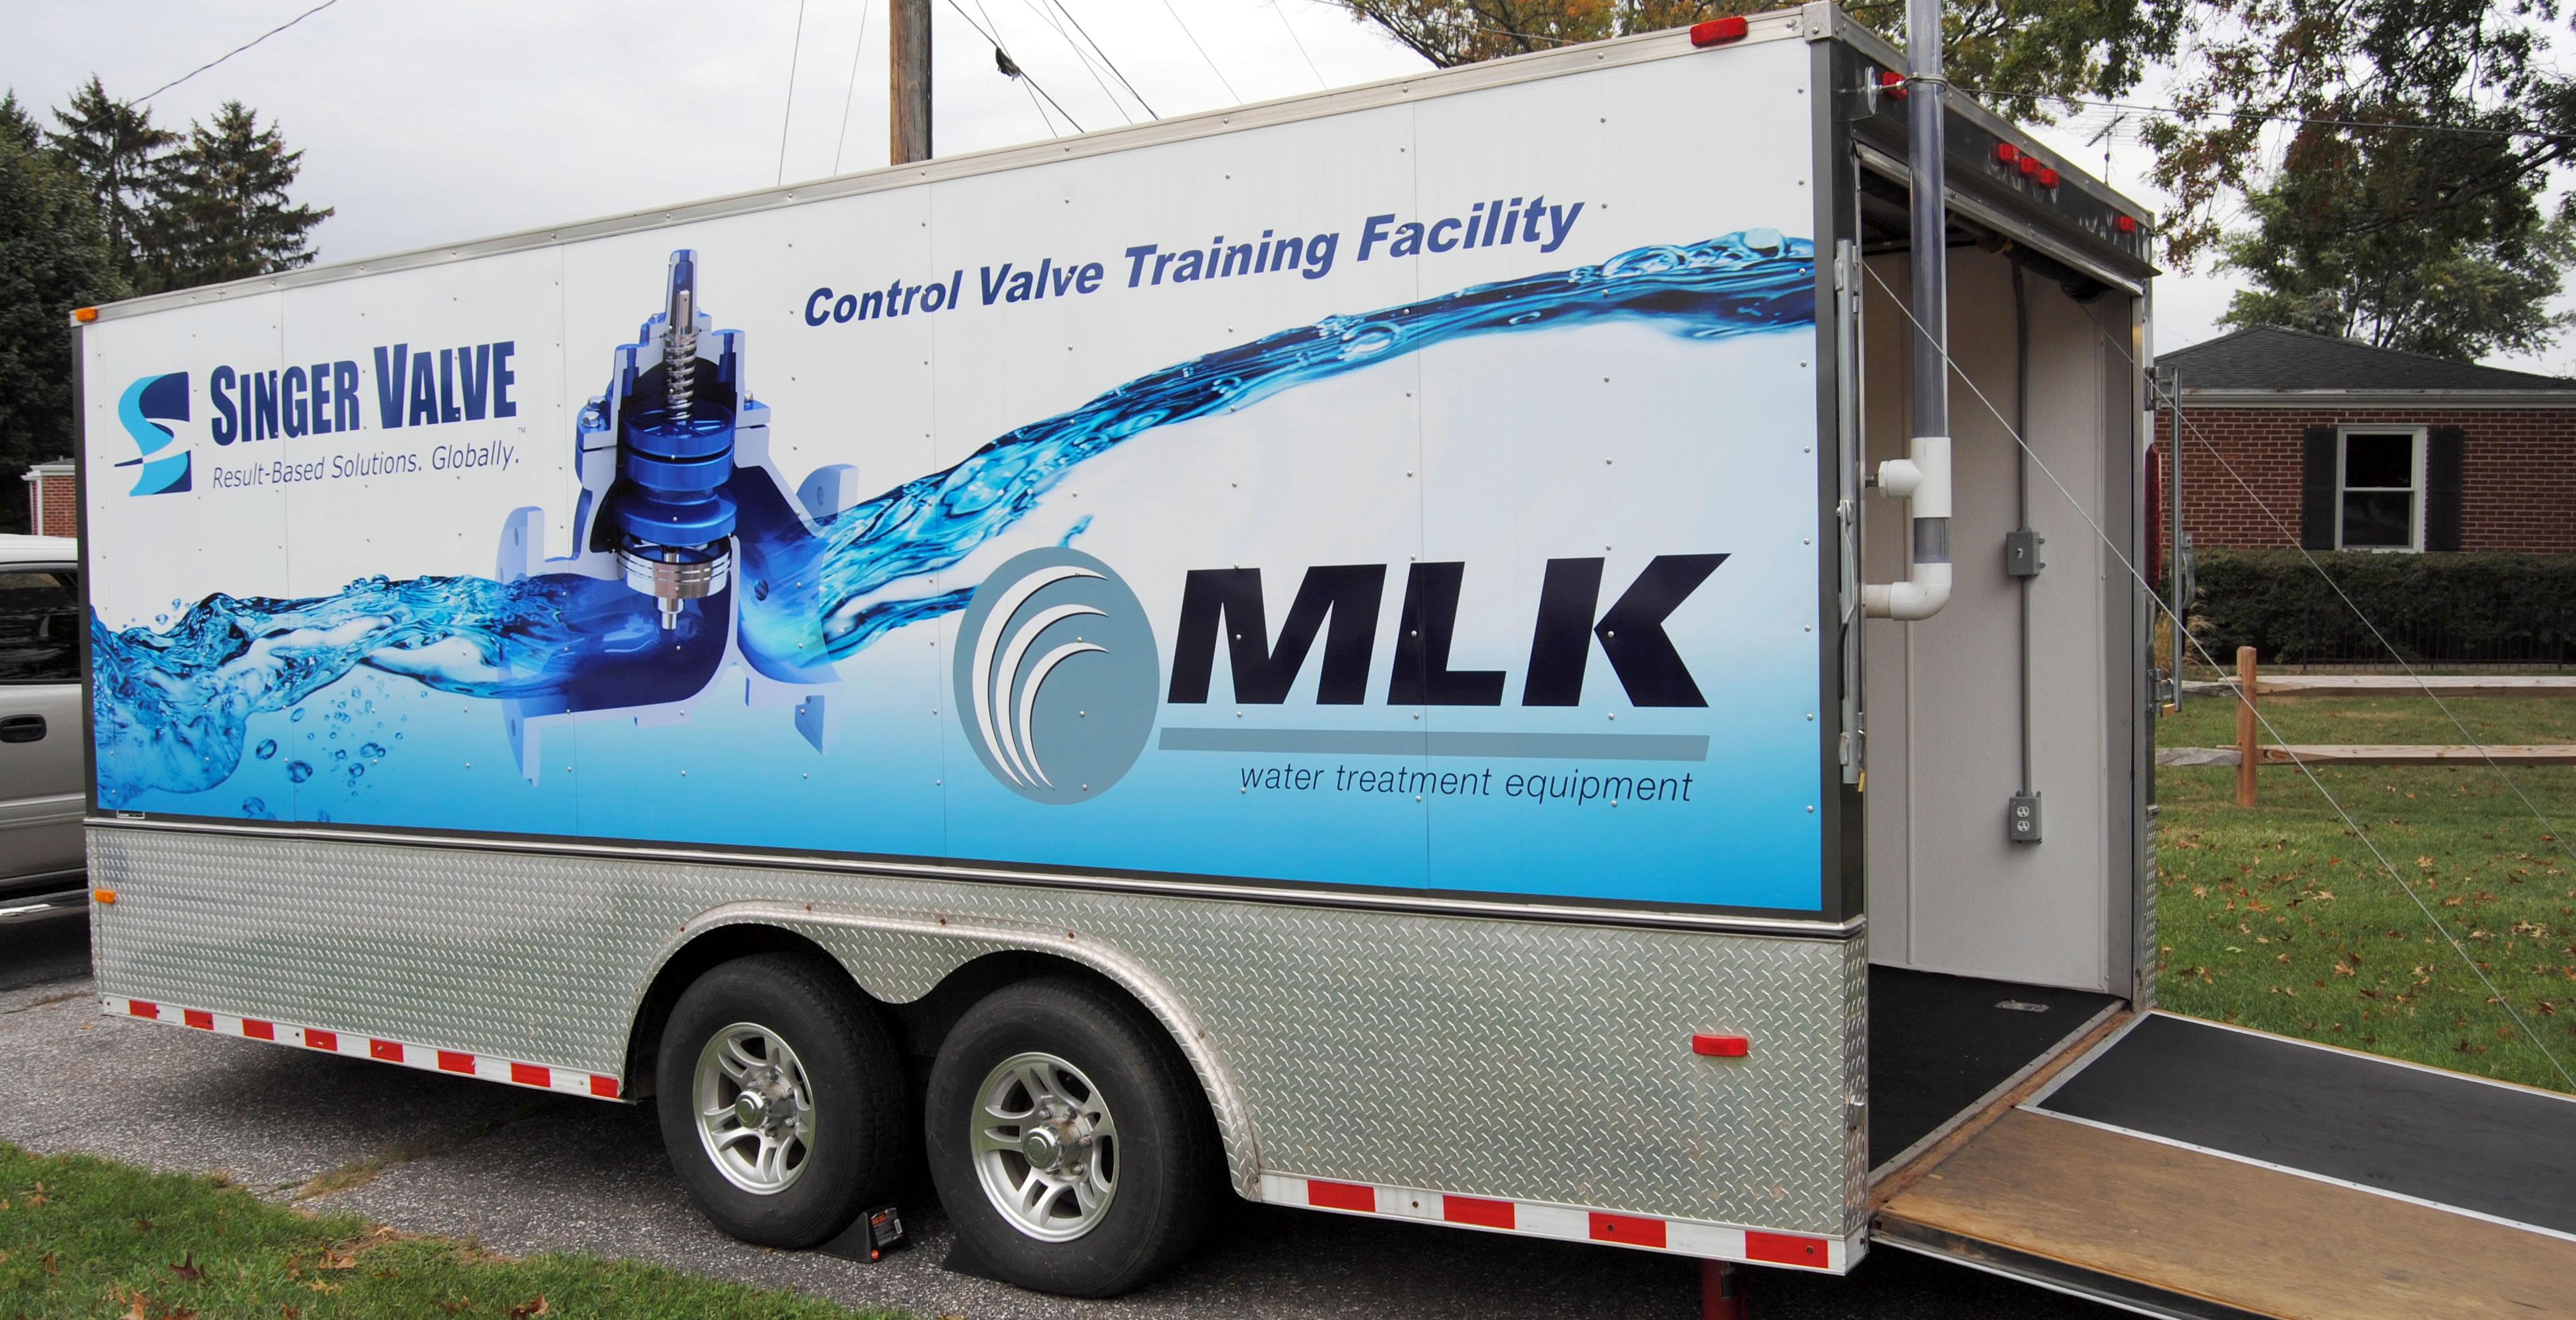 Control Valve Training Facility